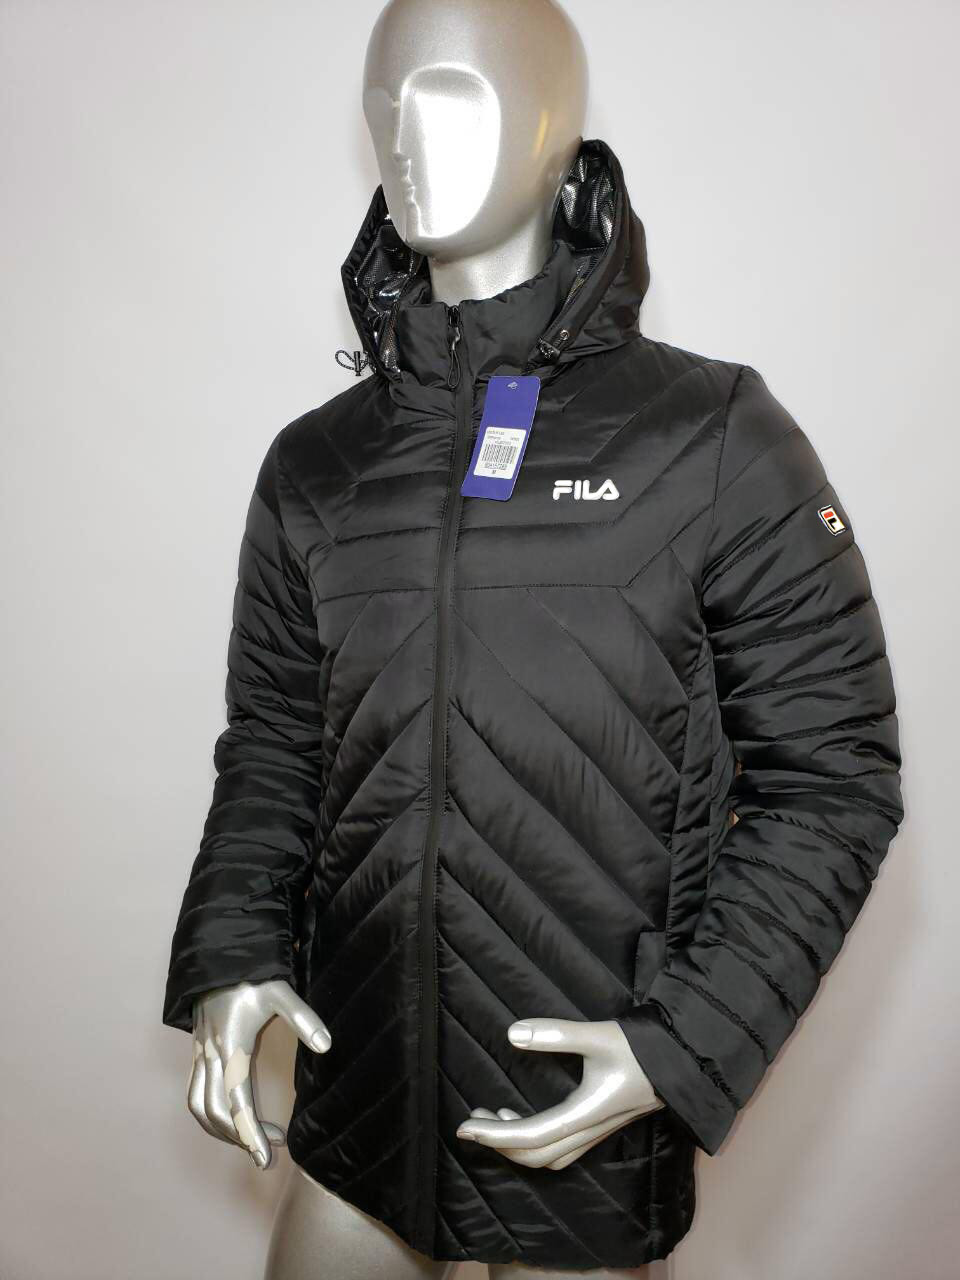 Мужская зимняя куртка Fila стёганная